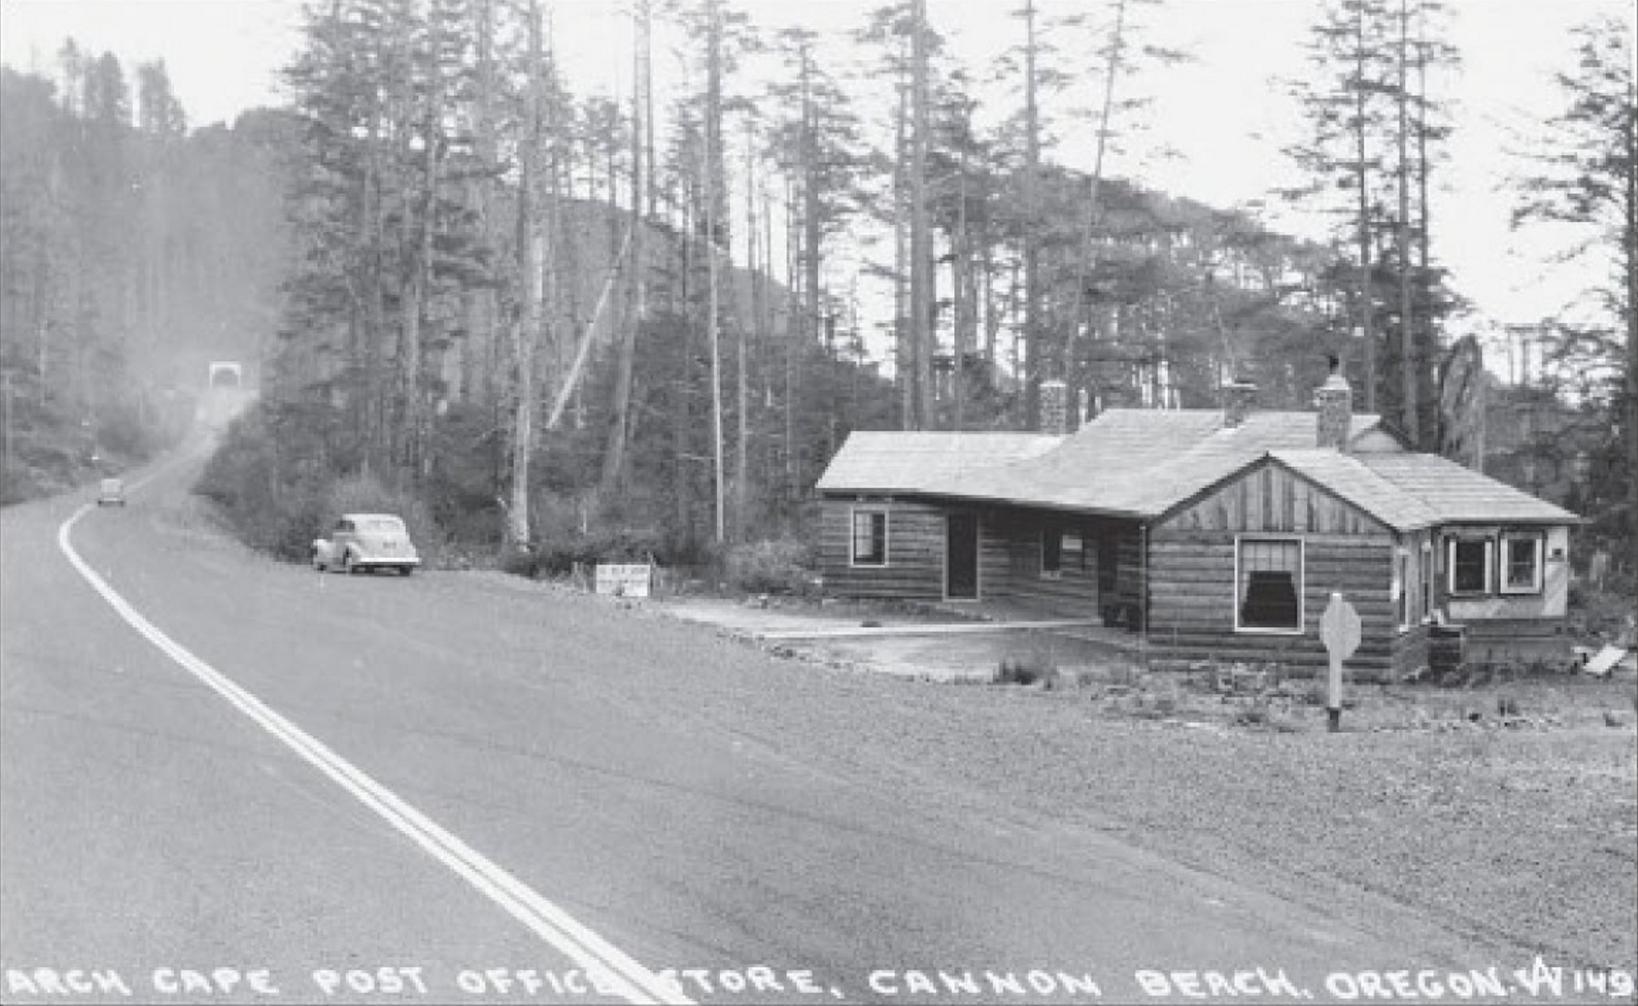 1940s Post Office Arch Cape Oregon Coast Inn at Arch Cape